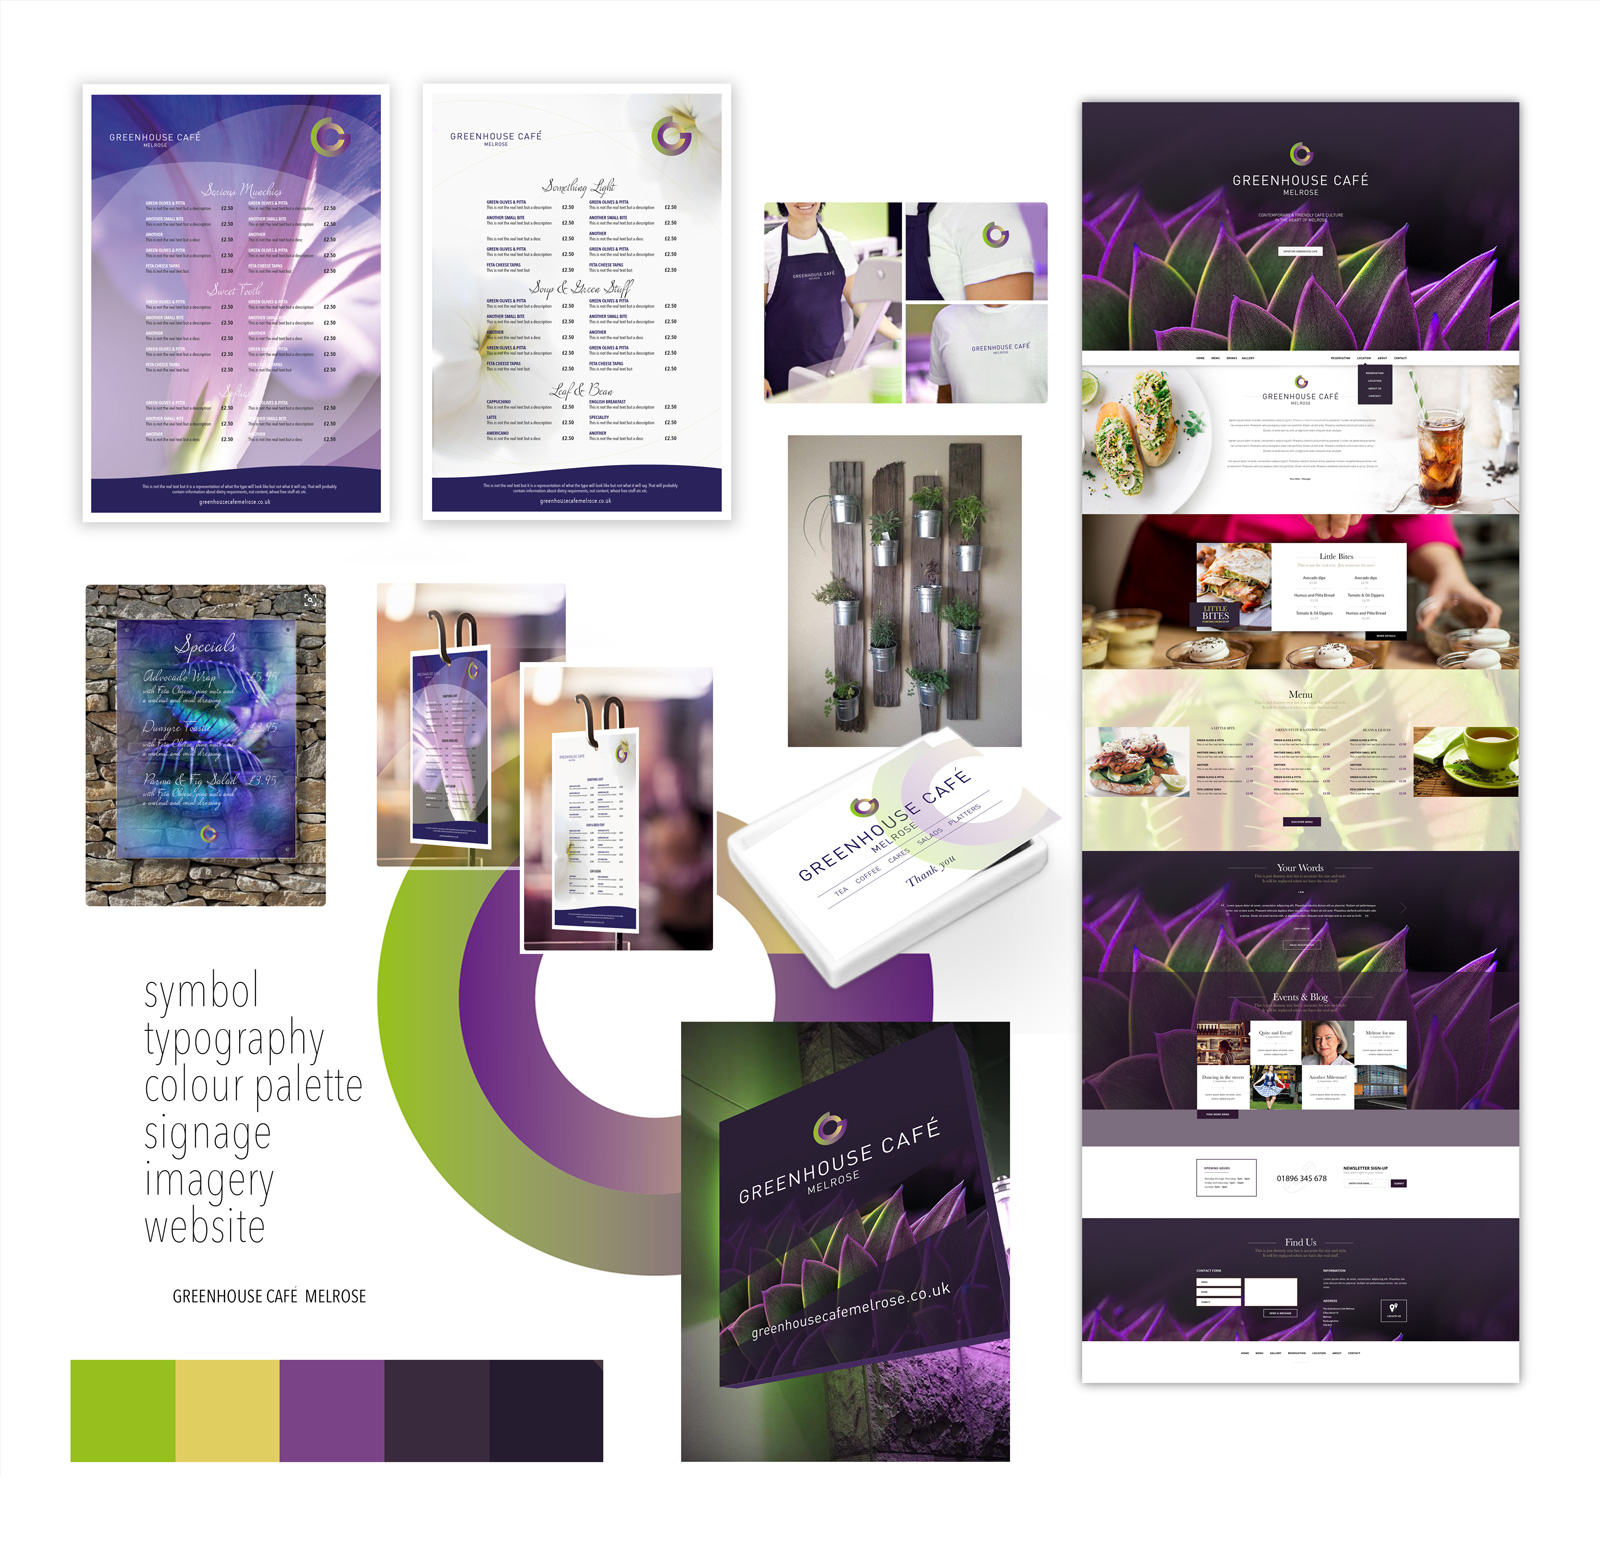 John Hamlin Greenhouse Cafe Branding Mood Board Design